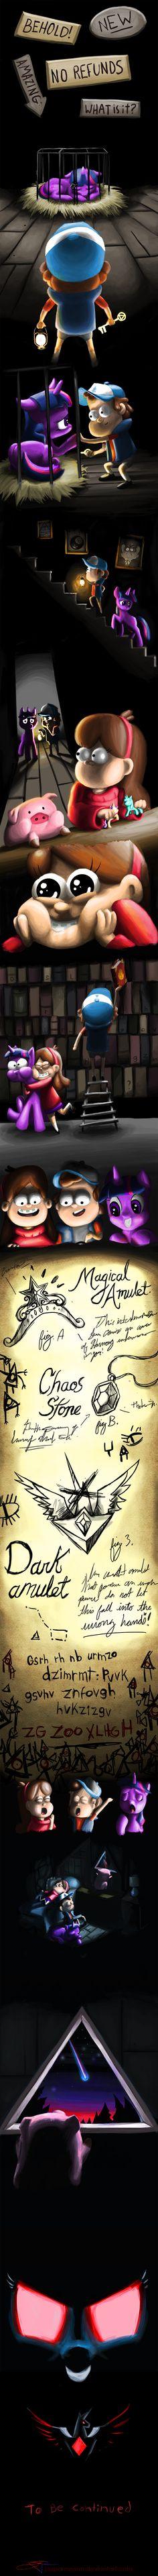 Magical Mystery Shack - PART 2 by JayParmesan.deviantart.com on @deviantART